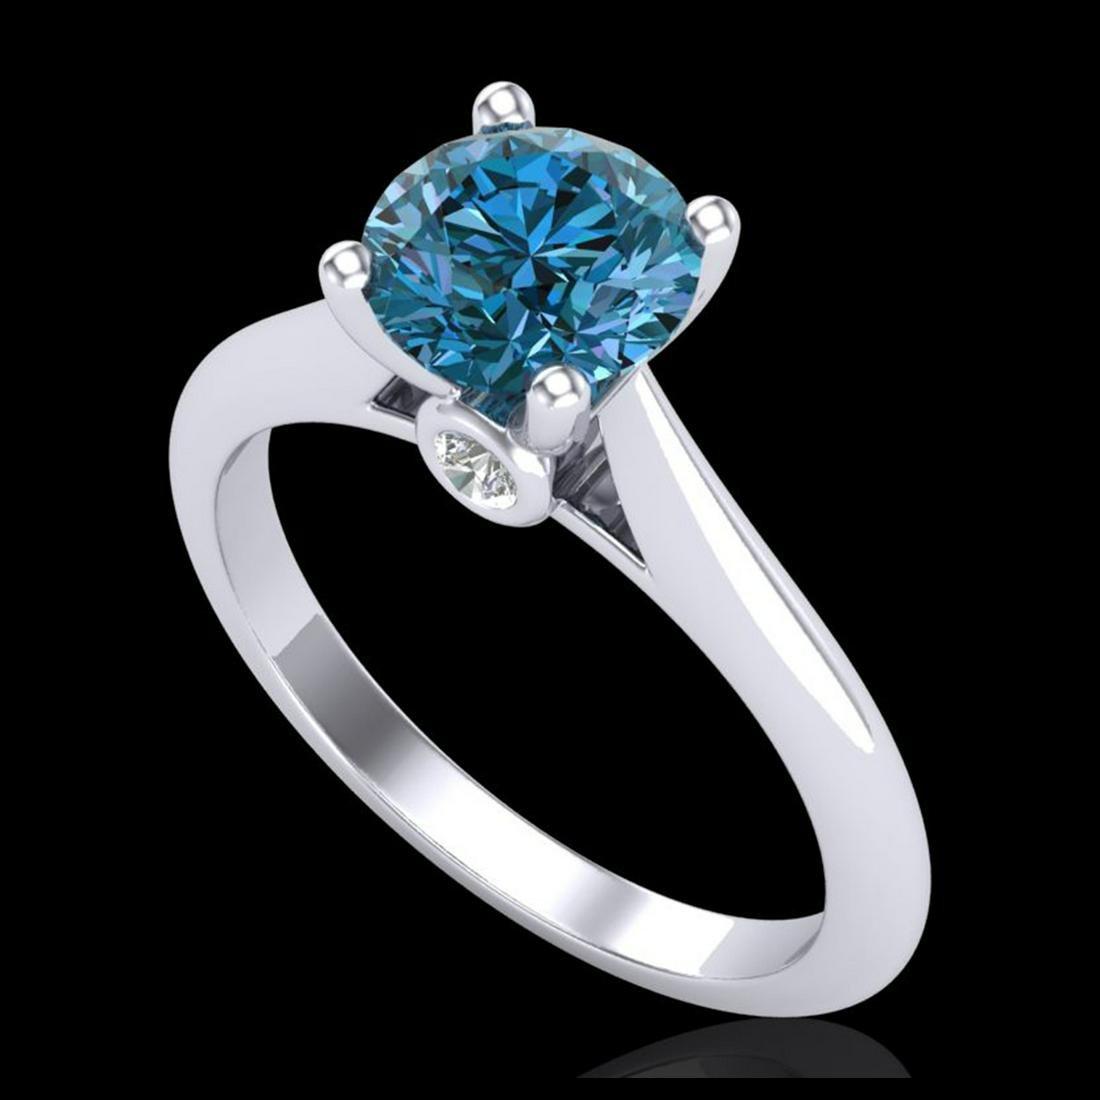 1.36 ctw Fancy Intense Blue Diamond Art Deco Ring 18K